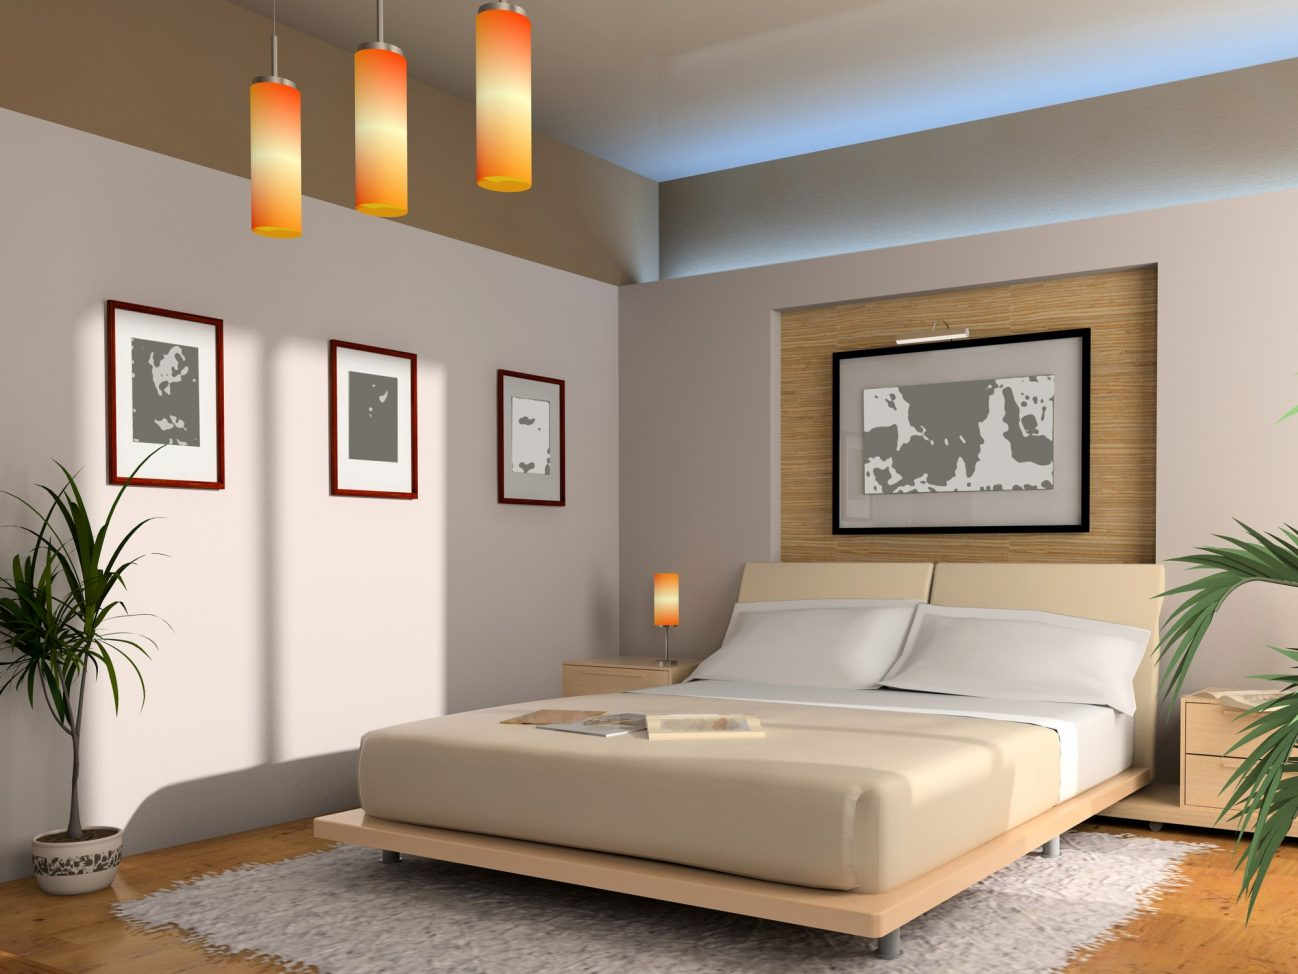 Оформление спальни по фен шуй фото